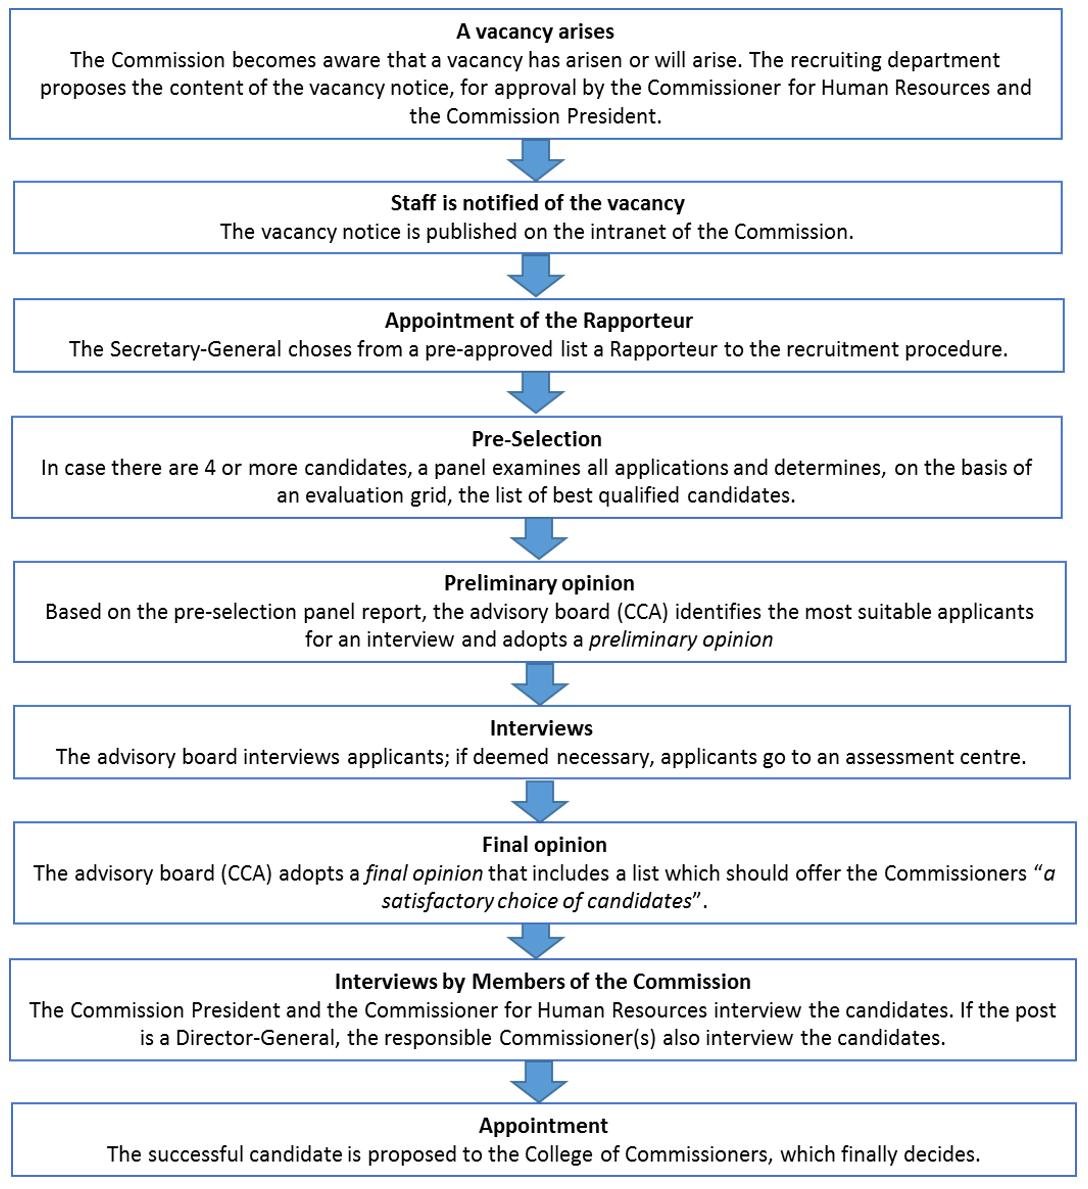 Vacancy Procedures for Senior Commission Officials